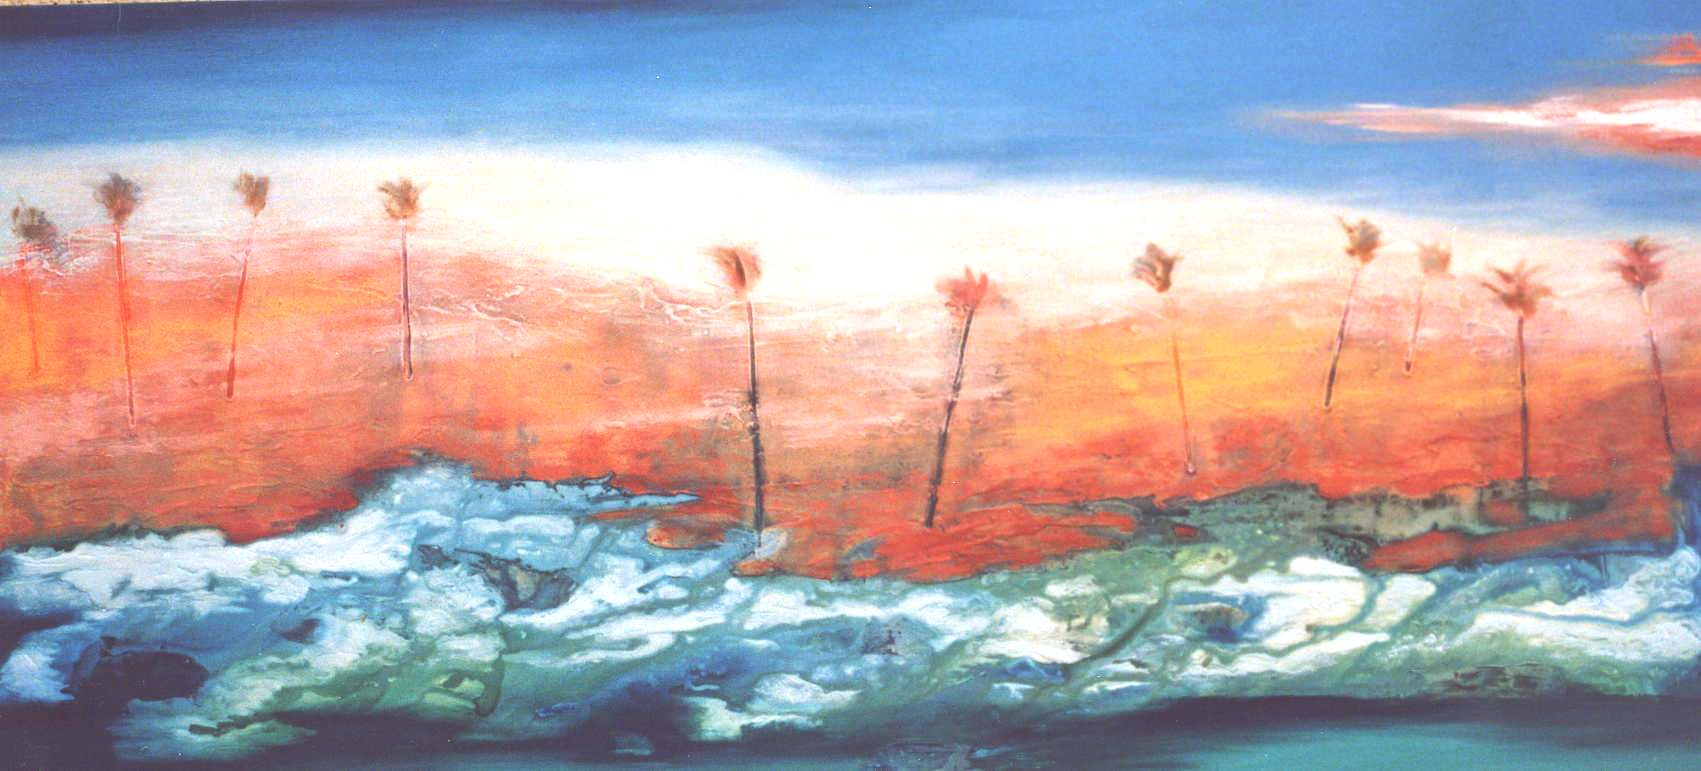 Windy Shoreline - 86x186cm - $4300